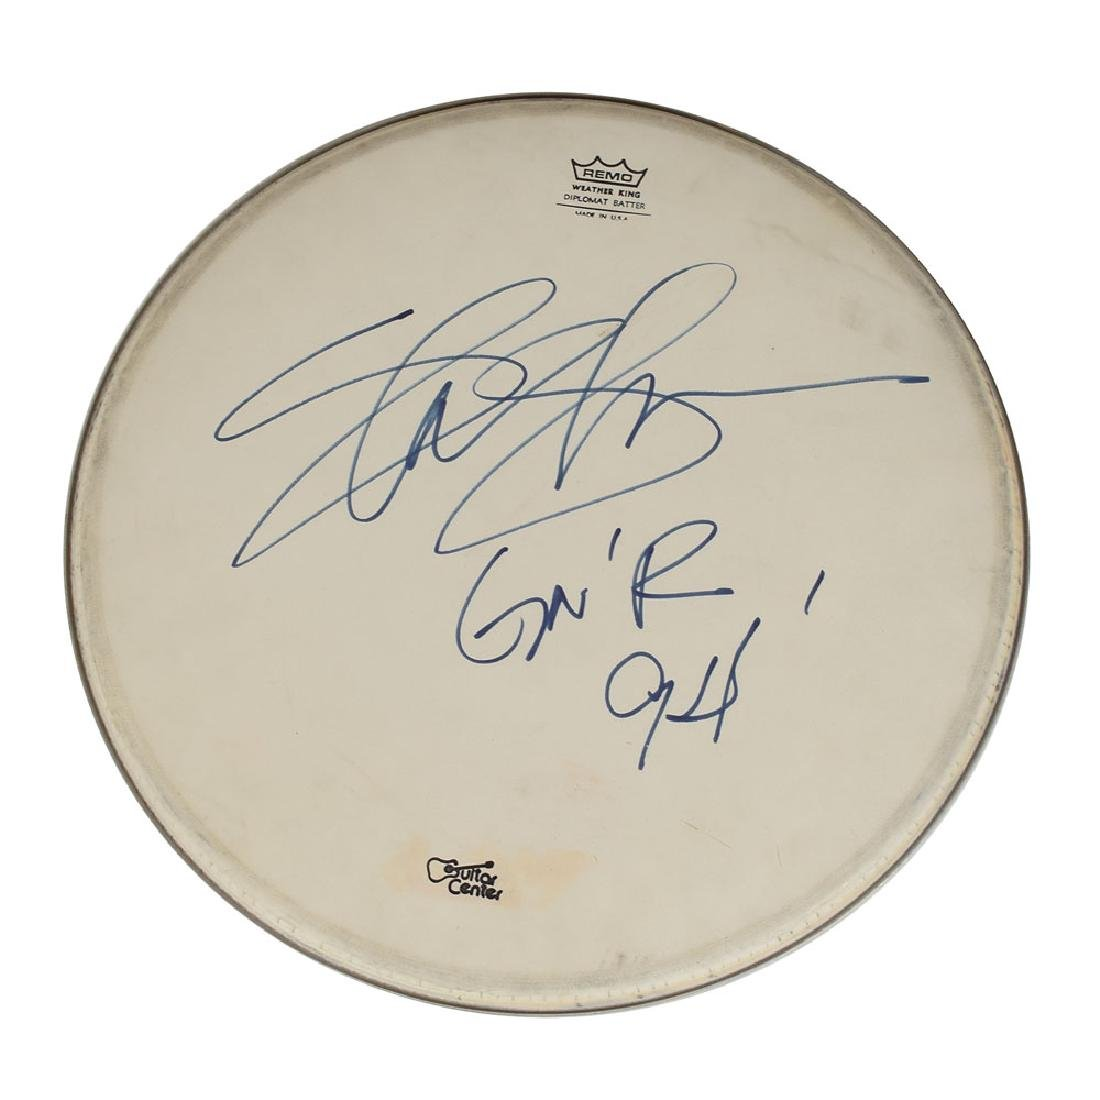 Guns N' Roses: Slash Signed Drum Head